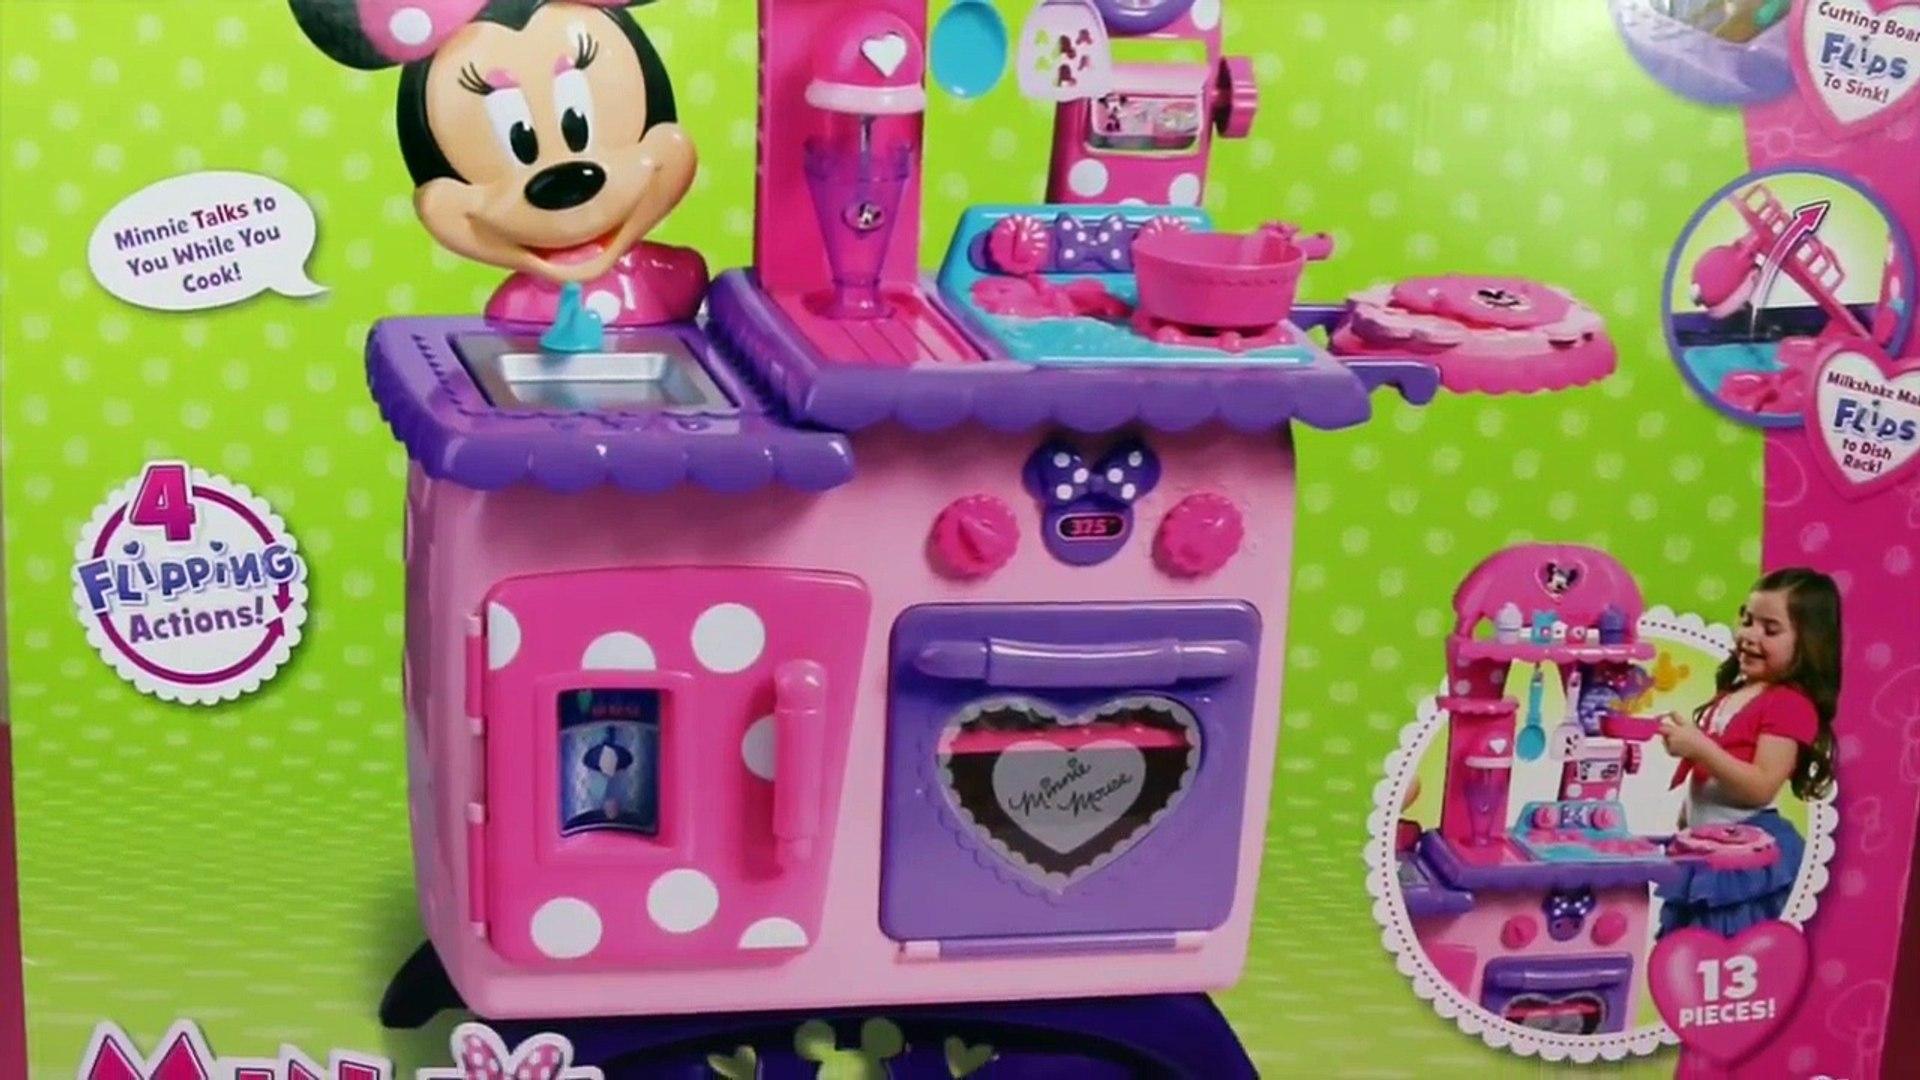 Minnie Mouse Kitchen Playset Flipping Fun Kitchen Cupcakes And Play Food Toys Disneycartoys Video Dailymotion